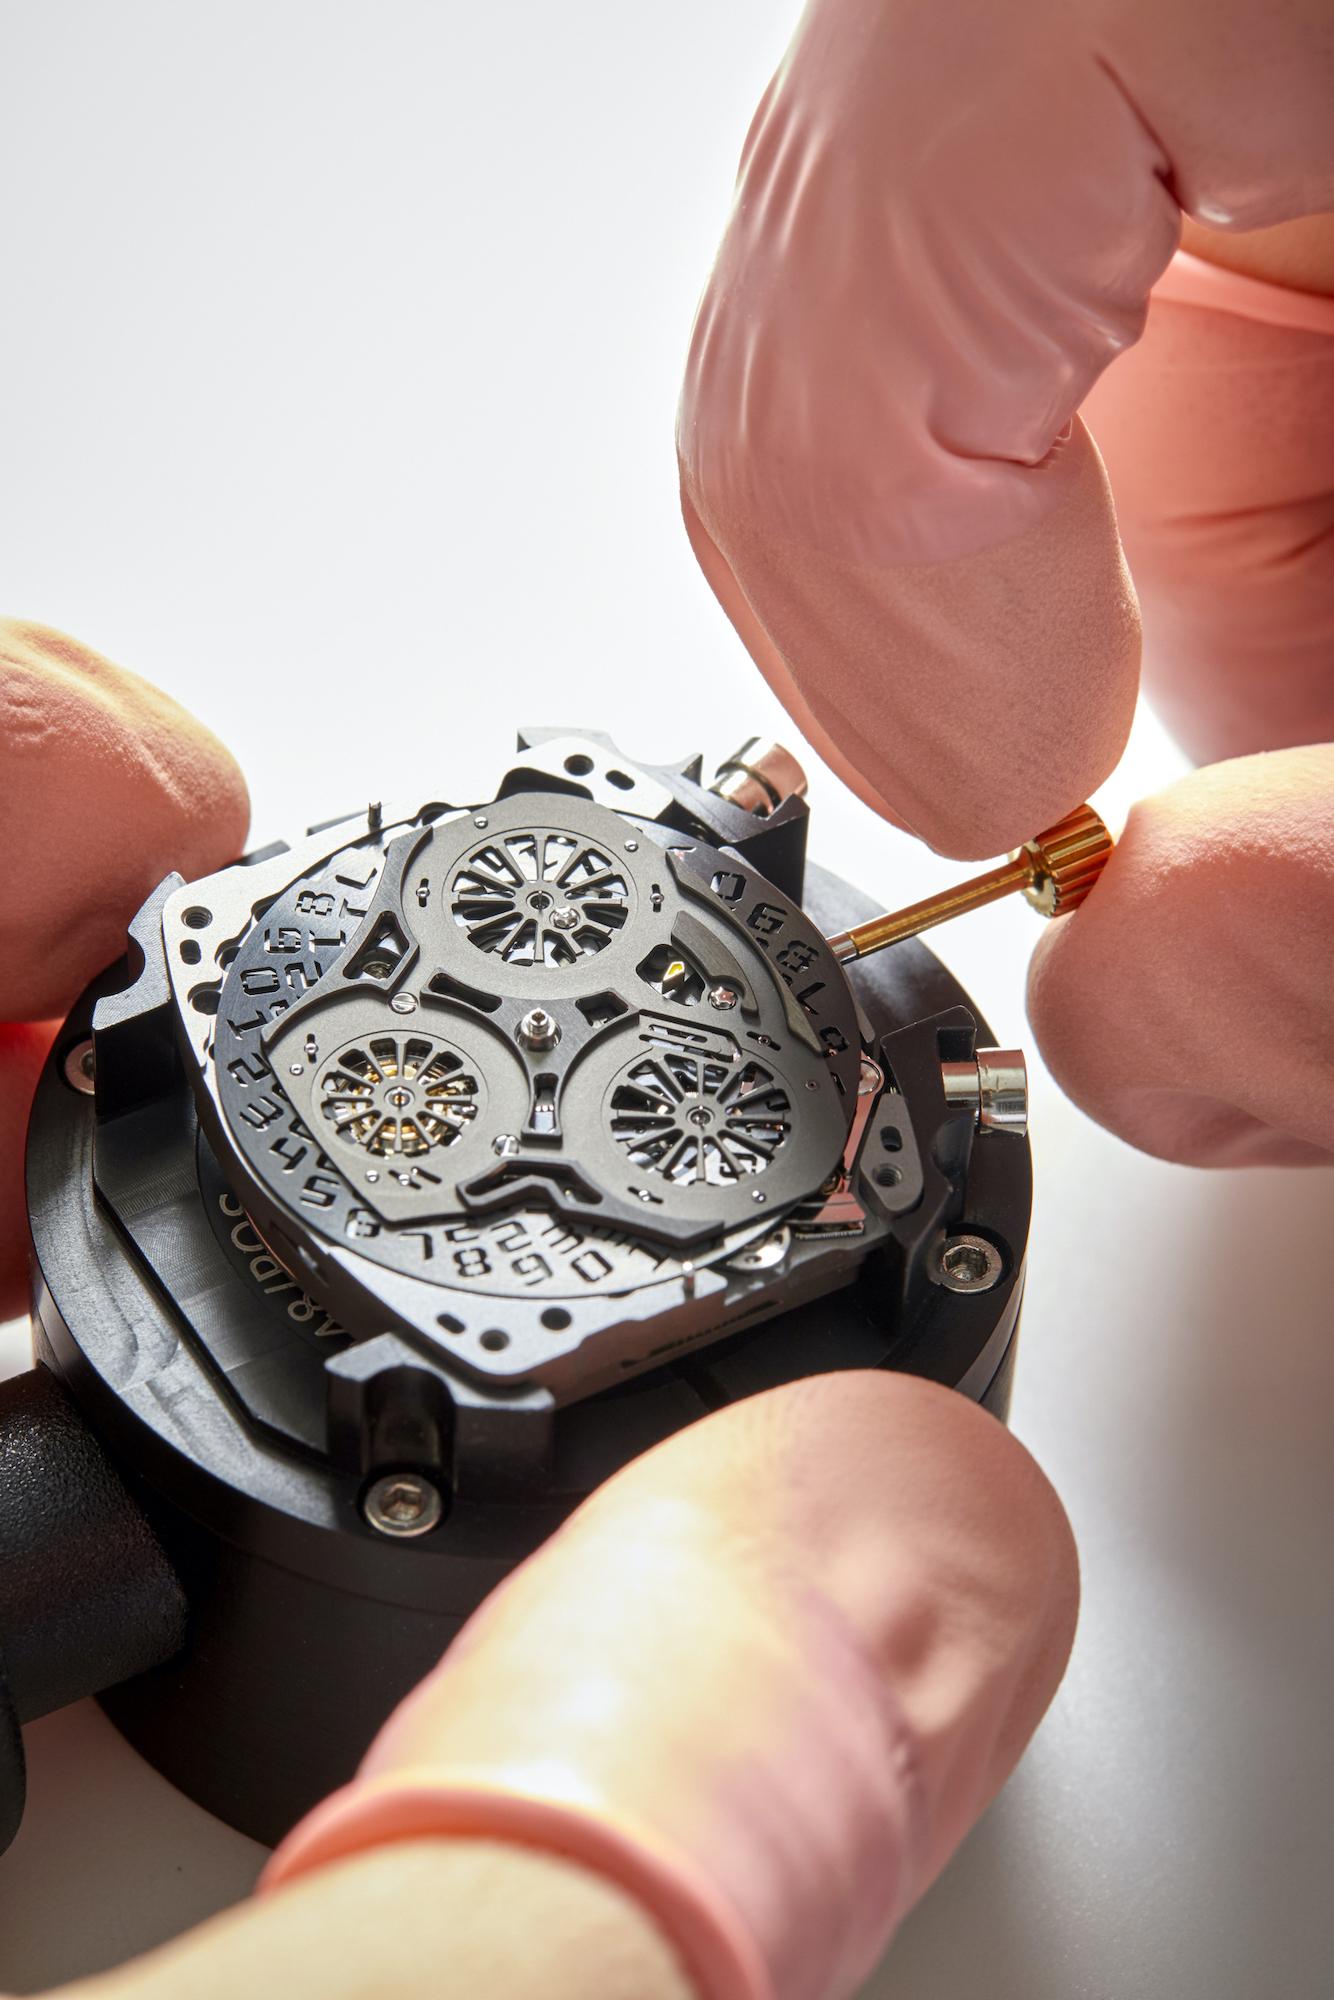 Richard Mille RM 72-01 Lifestyle Chronograph detalle movimiento y corona